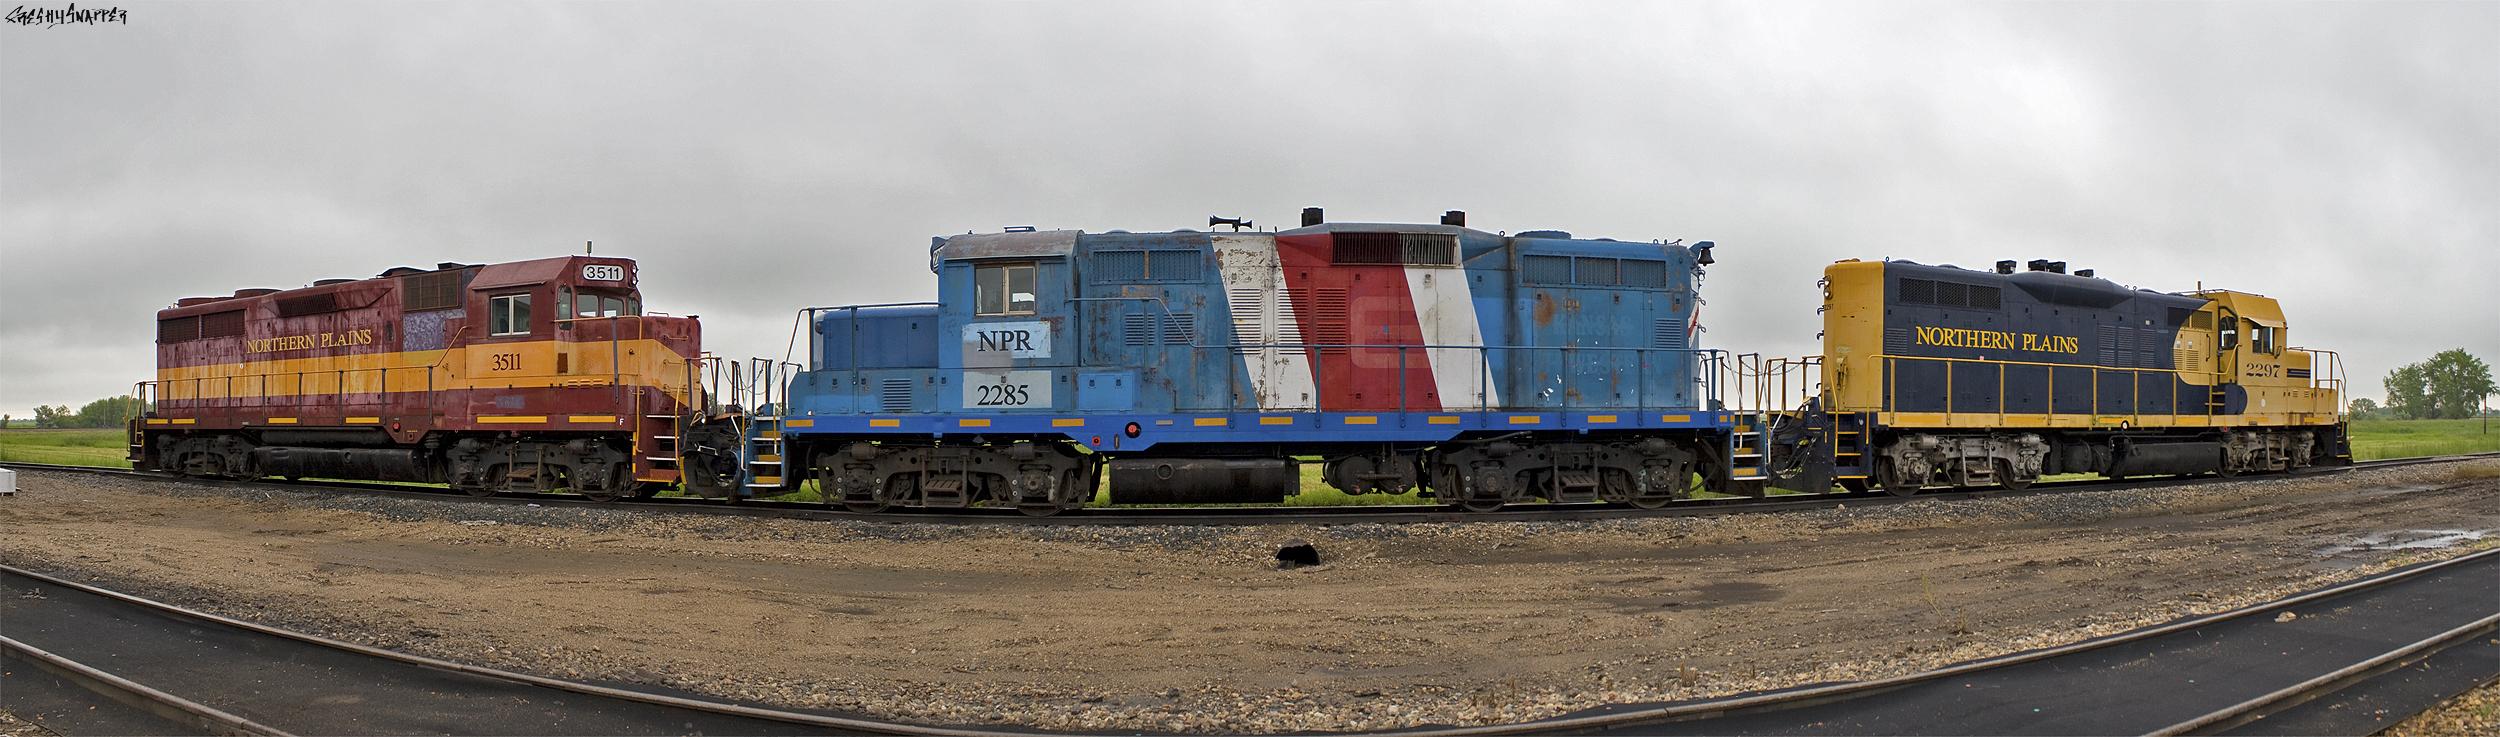 Trains - Northern Plains Railroad